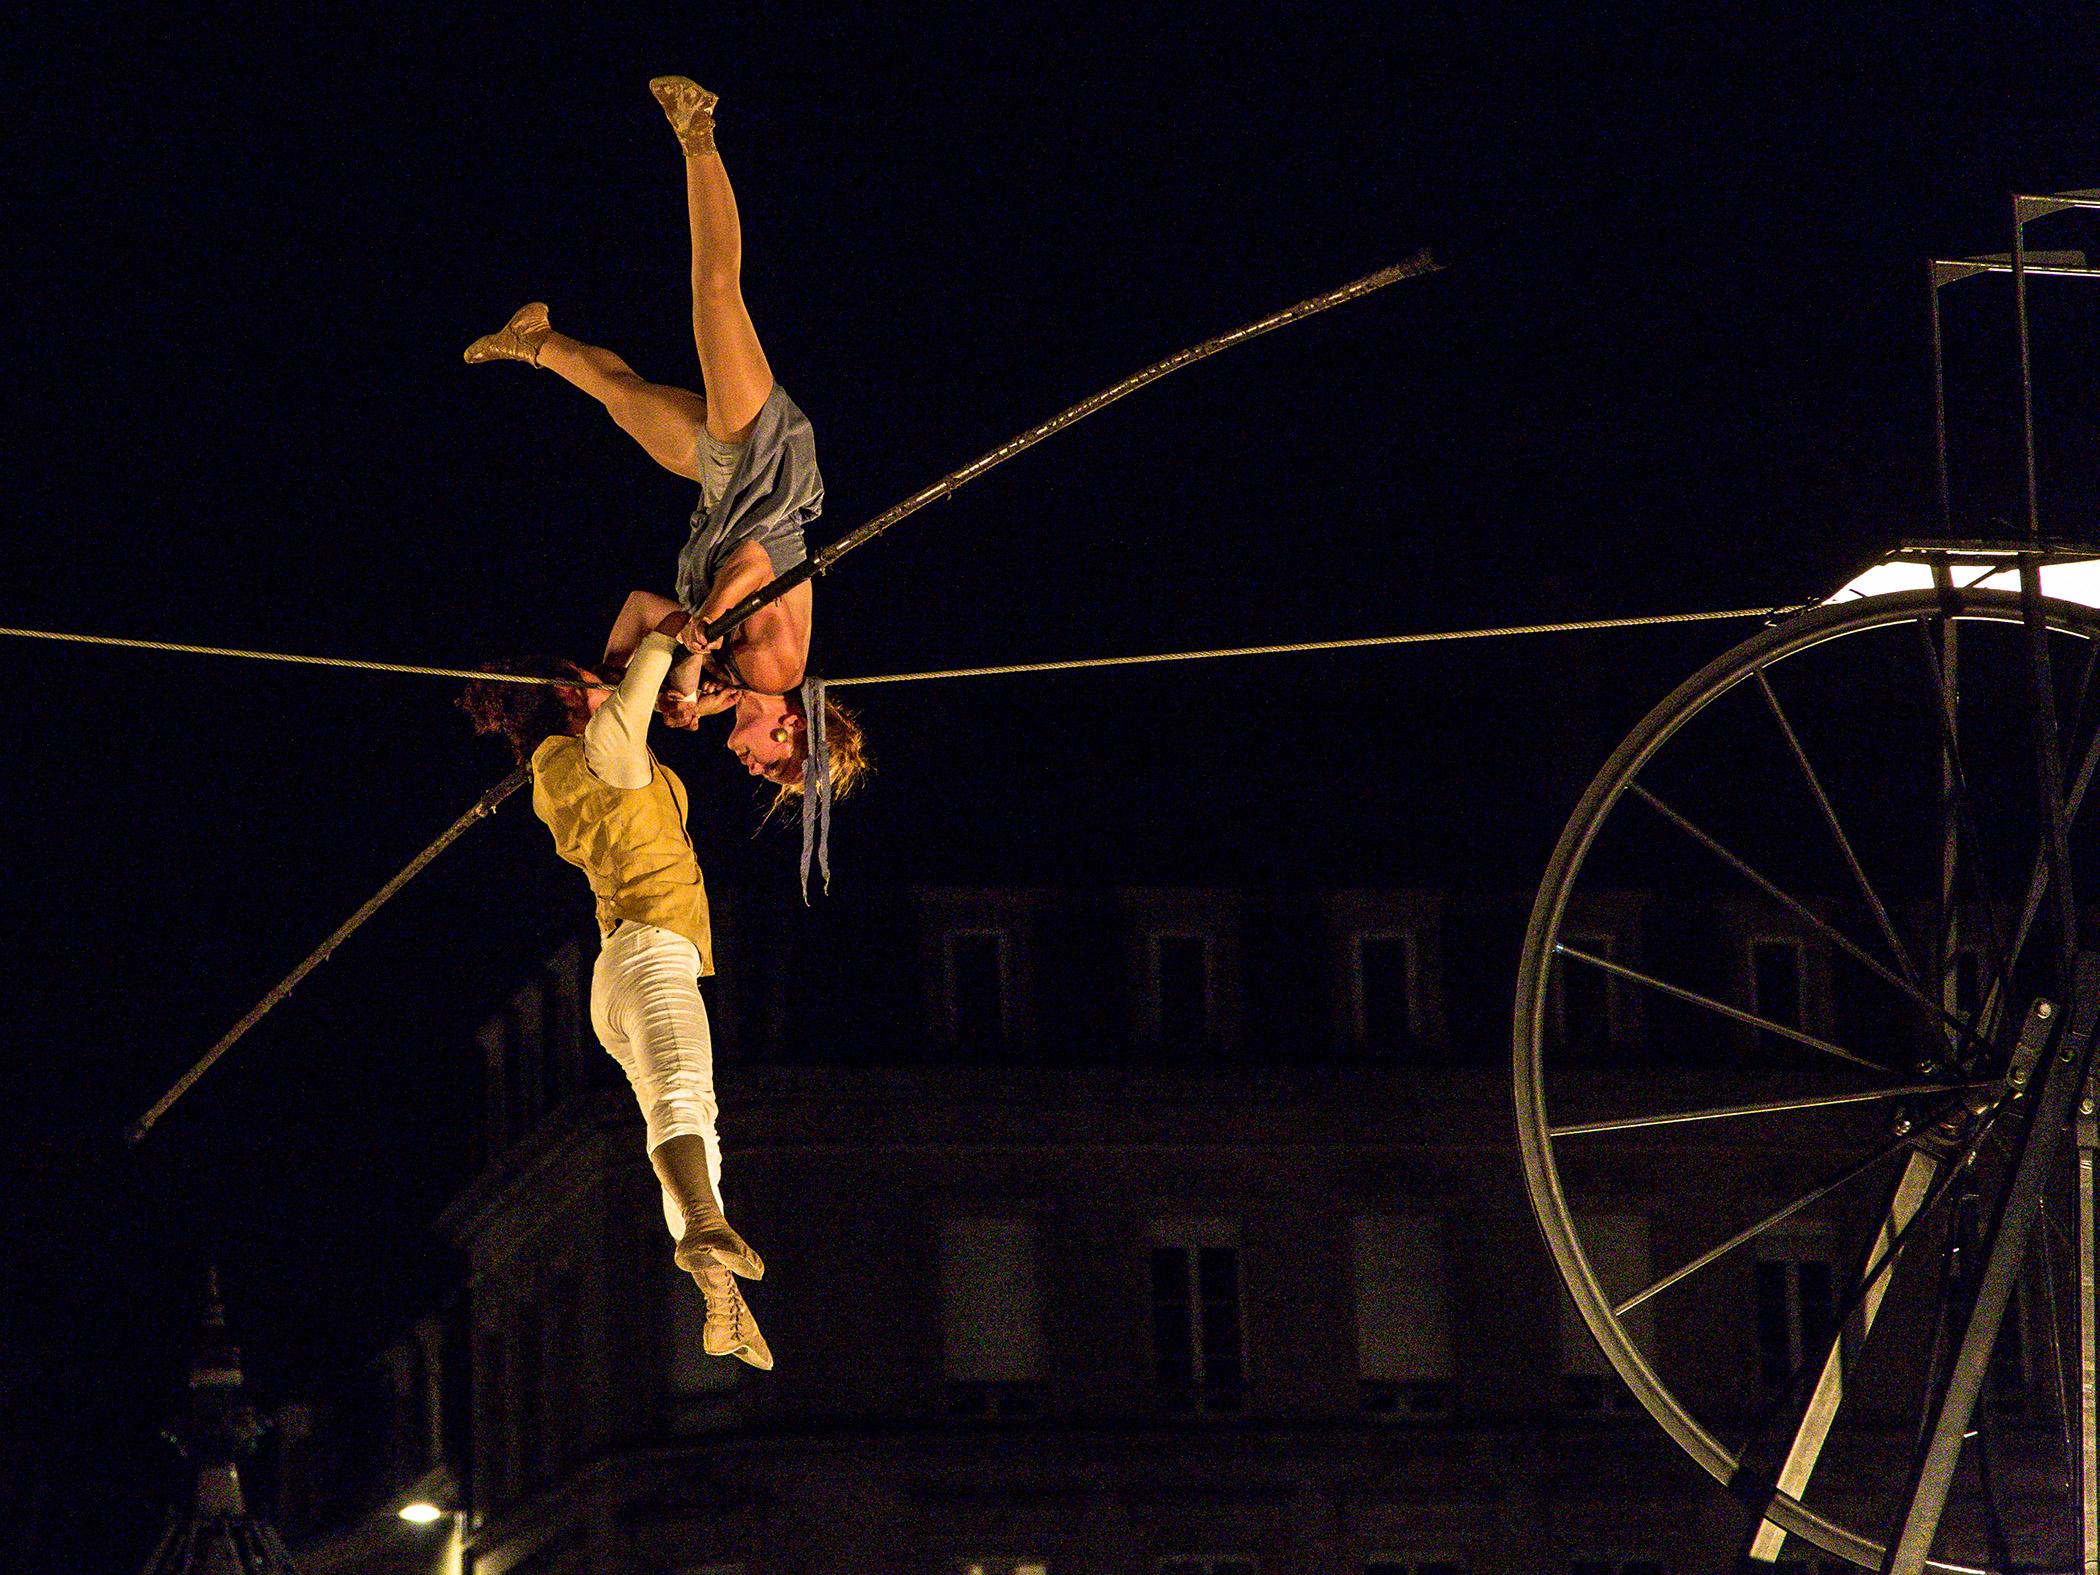 spectacles-sodade-cirque-rouage-mirabelle-metz-2015-marie-colette-becker-03